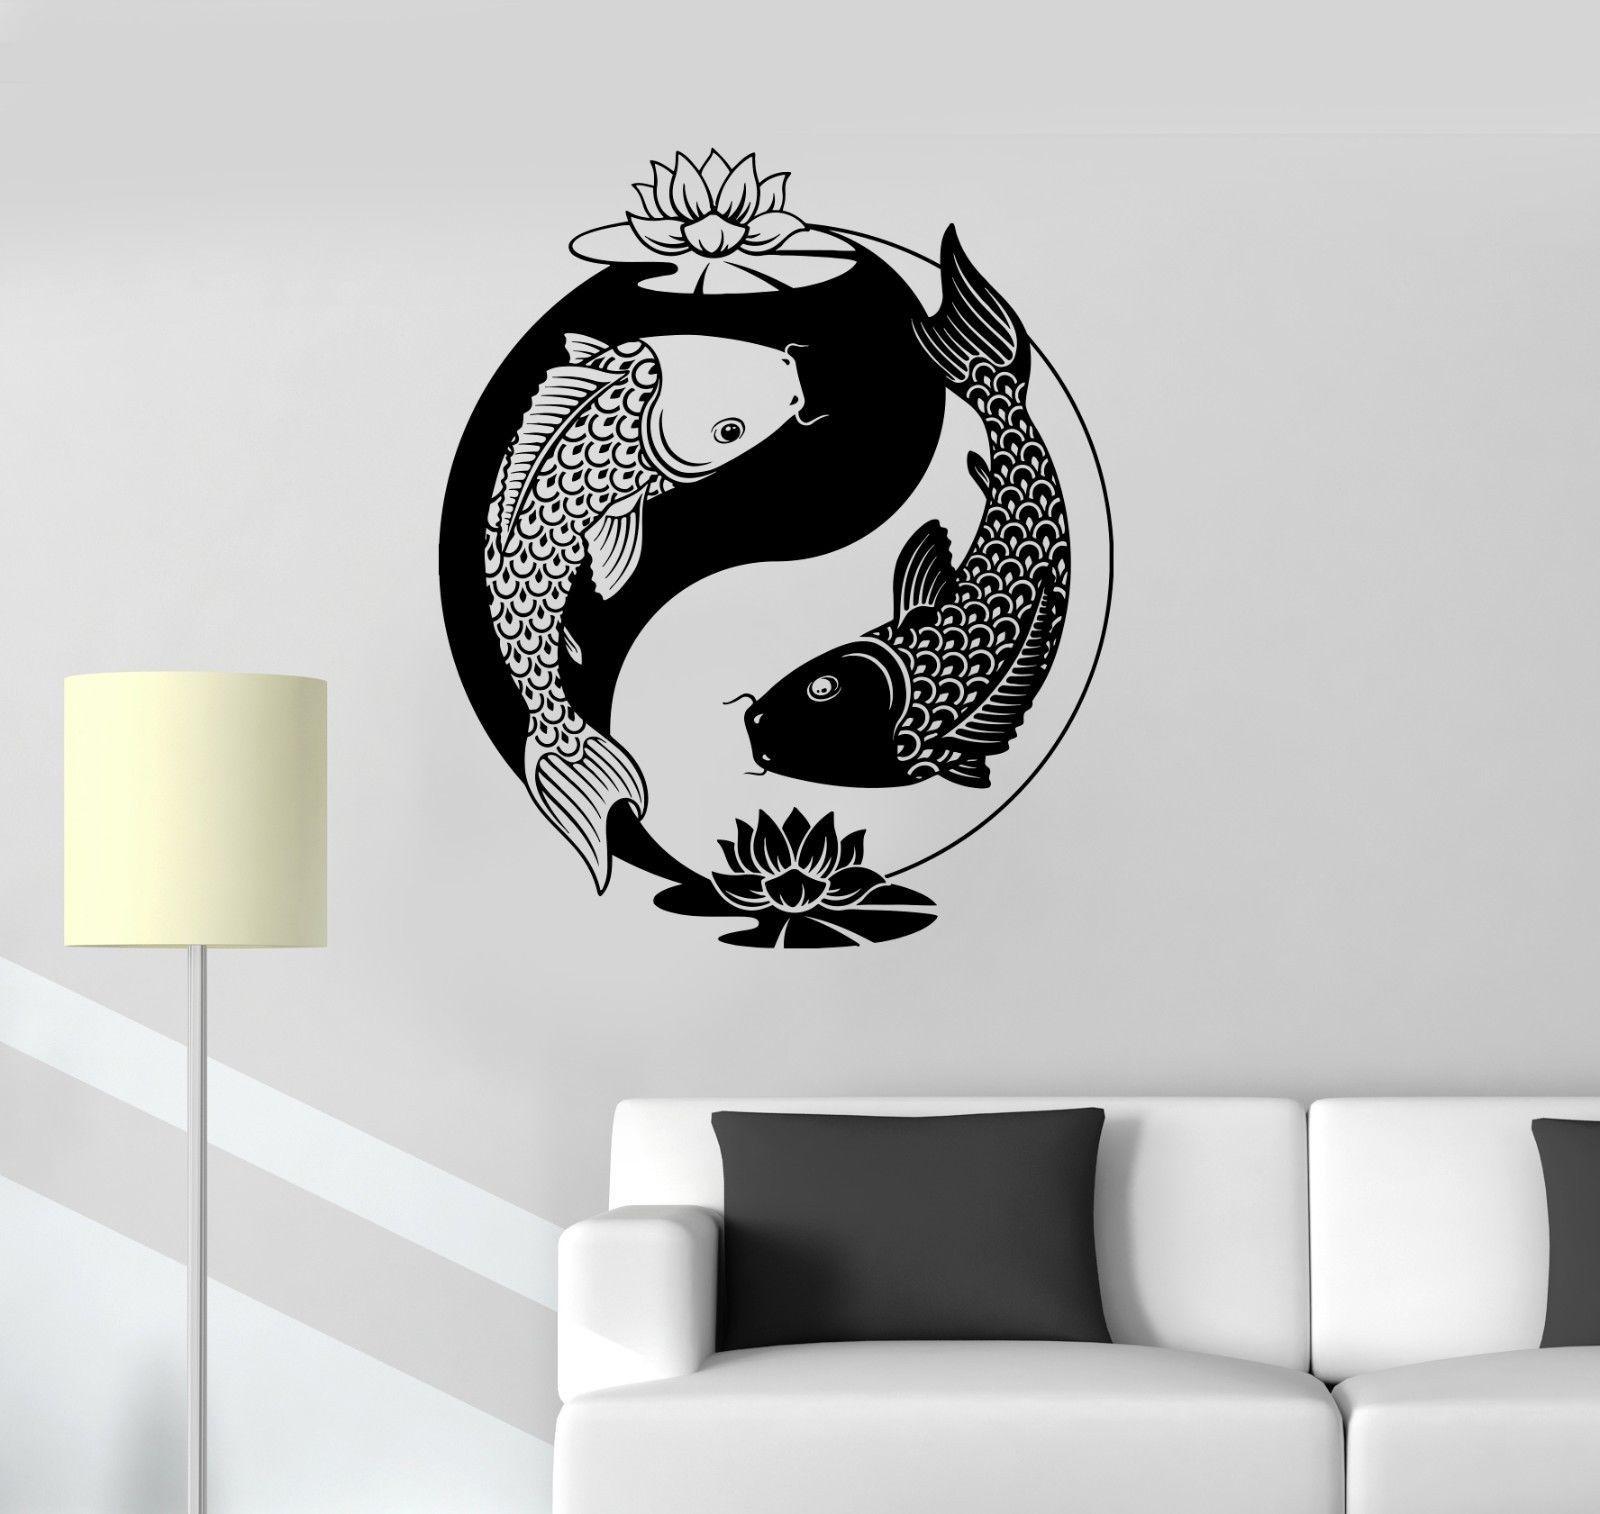 Yin Yang Tai Lotus Chinois Philosophie Zen Poisson Vinyle Wall Sticker Decal livraison gratuite